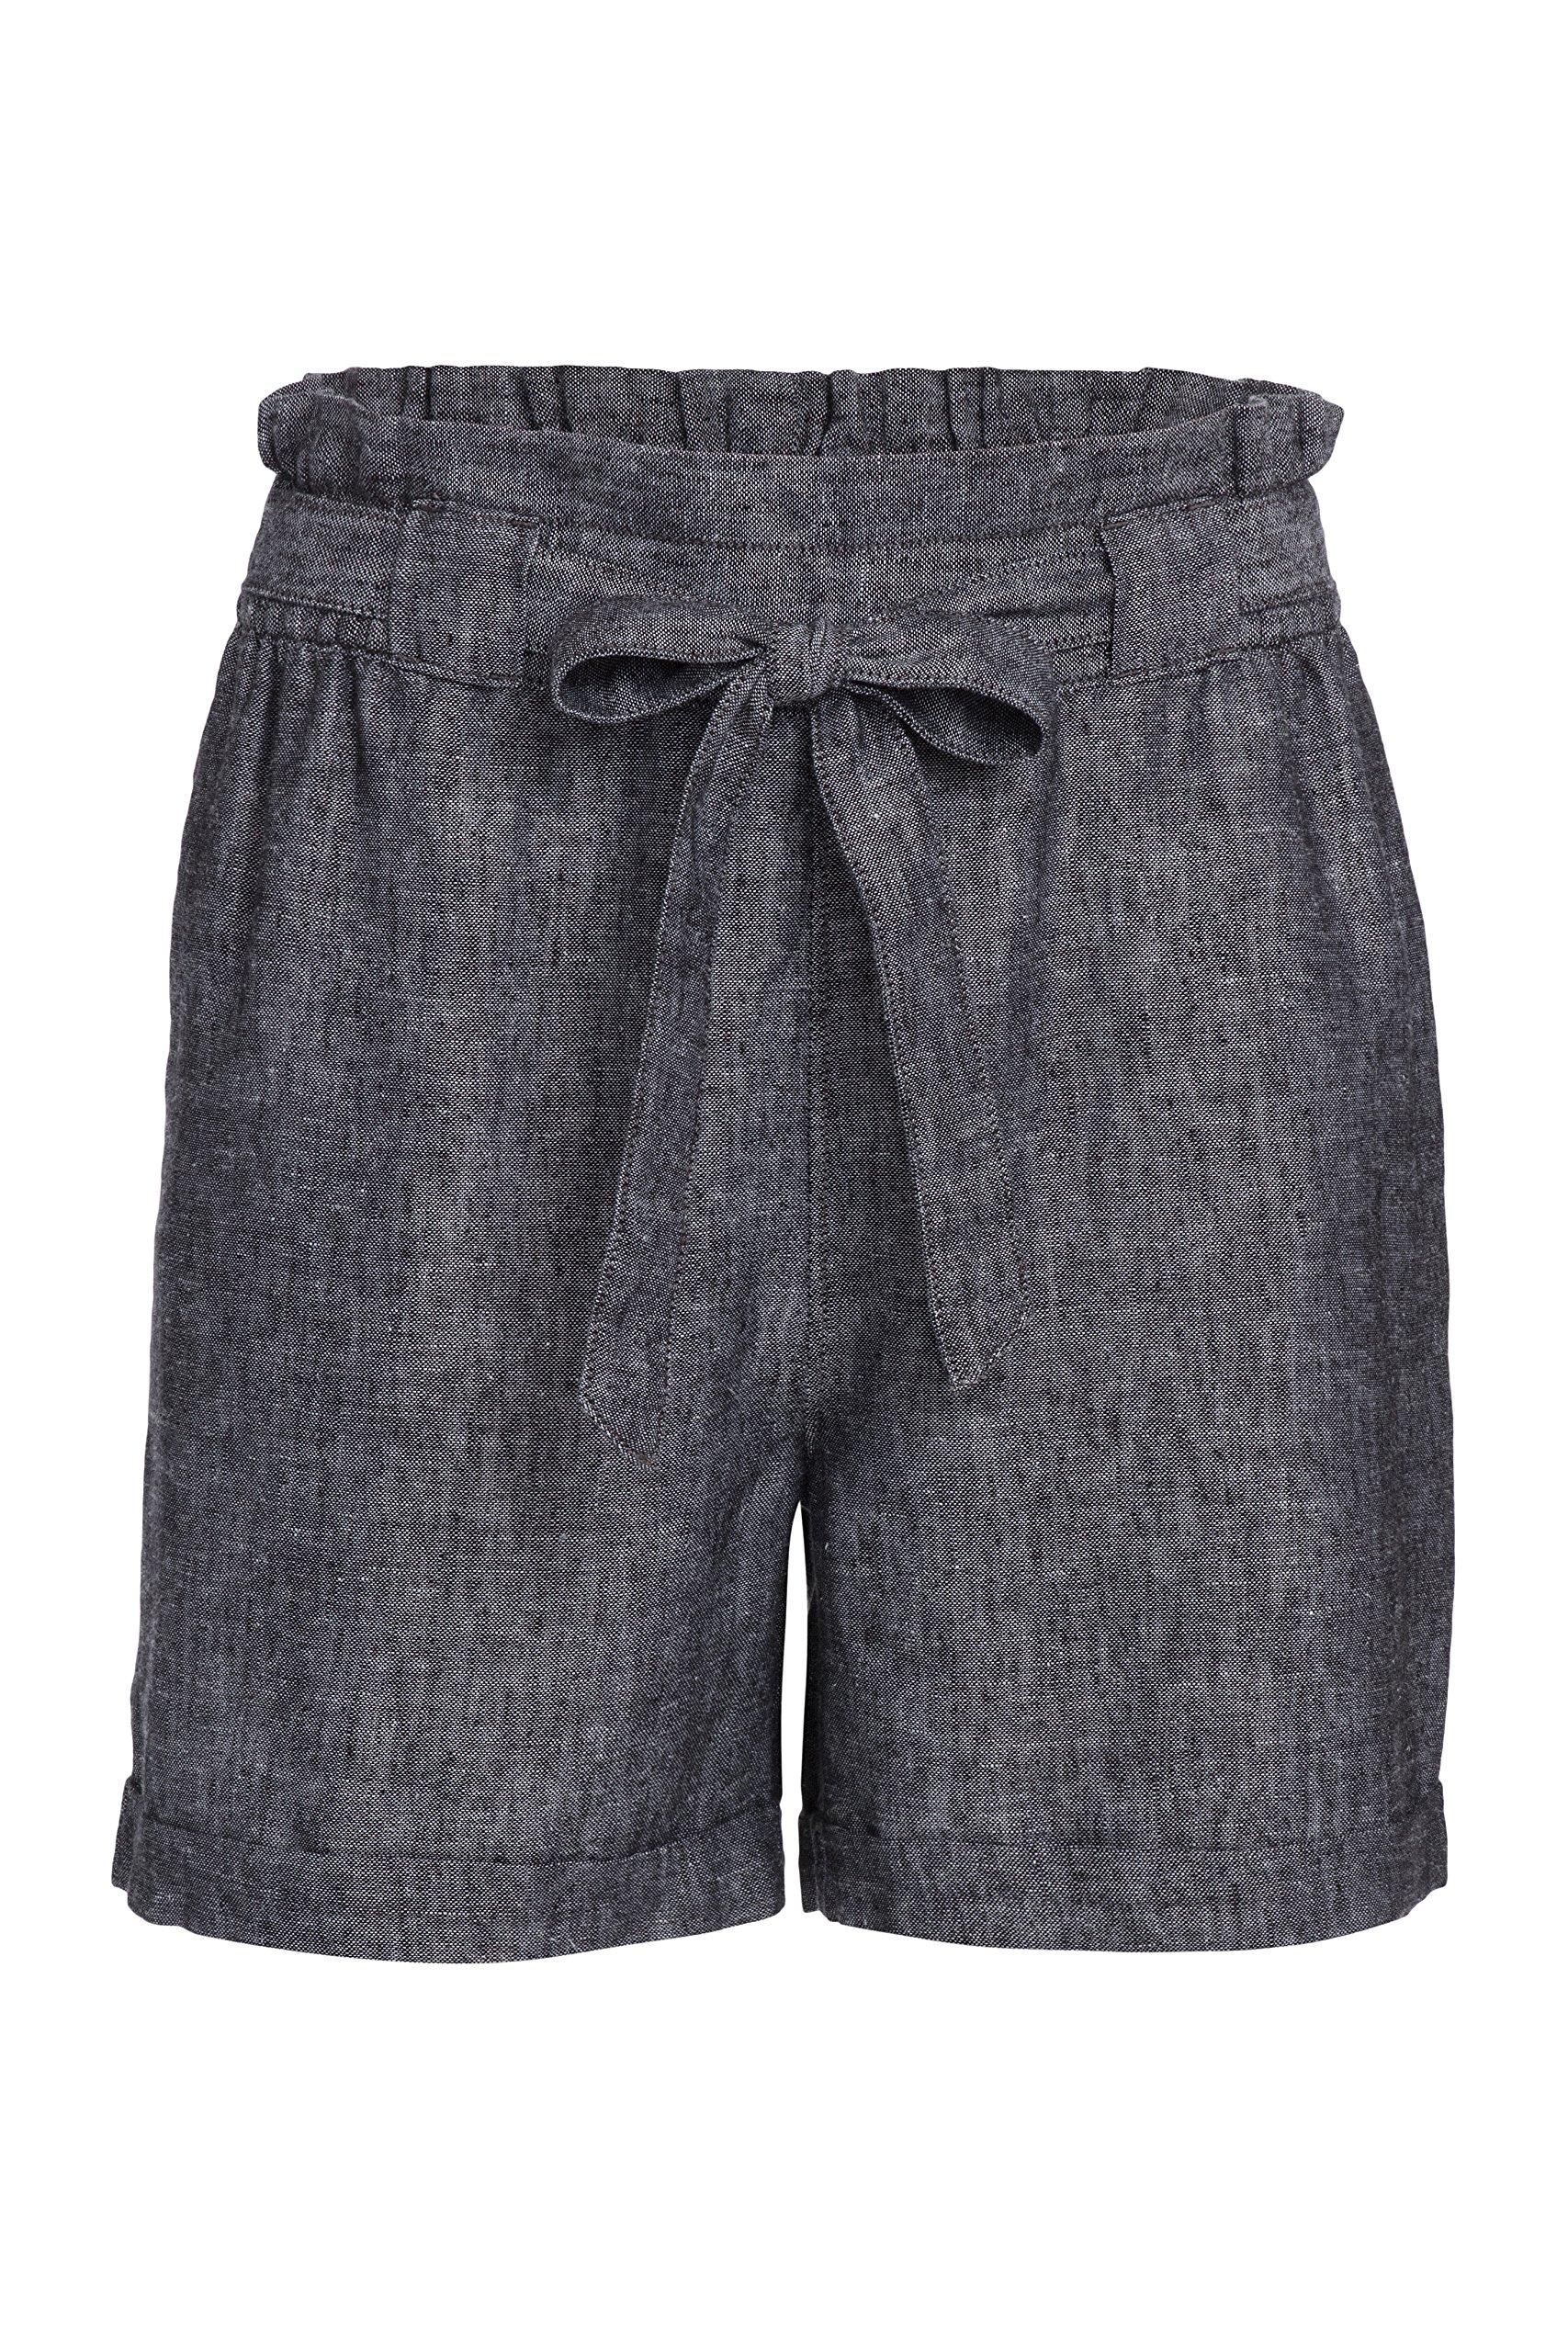 Alki'i Women's Casual Linen Paper Bag Shorts 1194 Black Chambray L